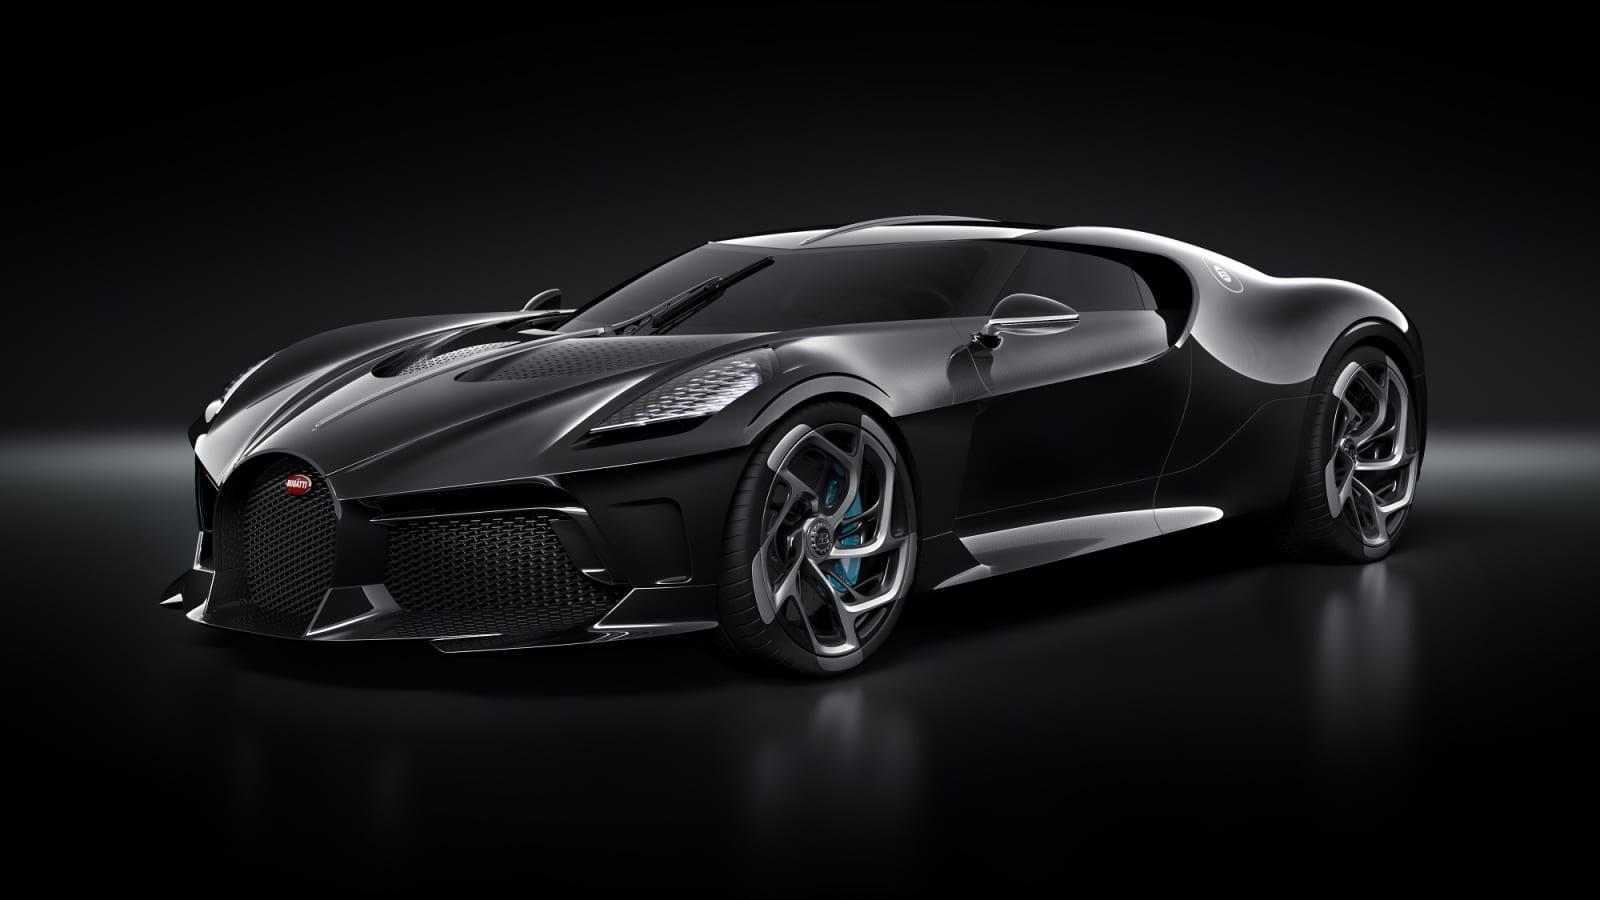 Take A Look Bugatti S La Voiture Noire Car Just Sold For 19 Million